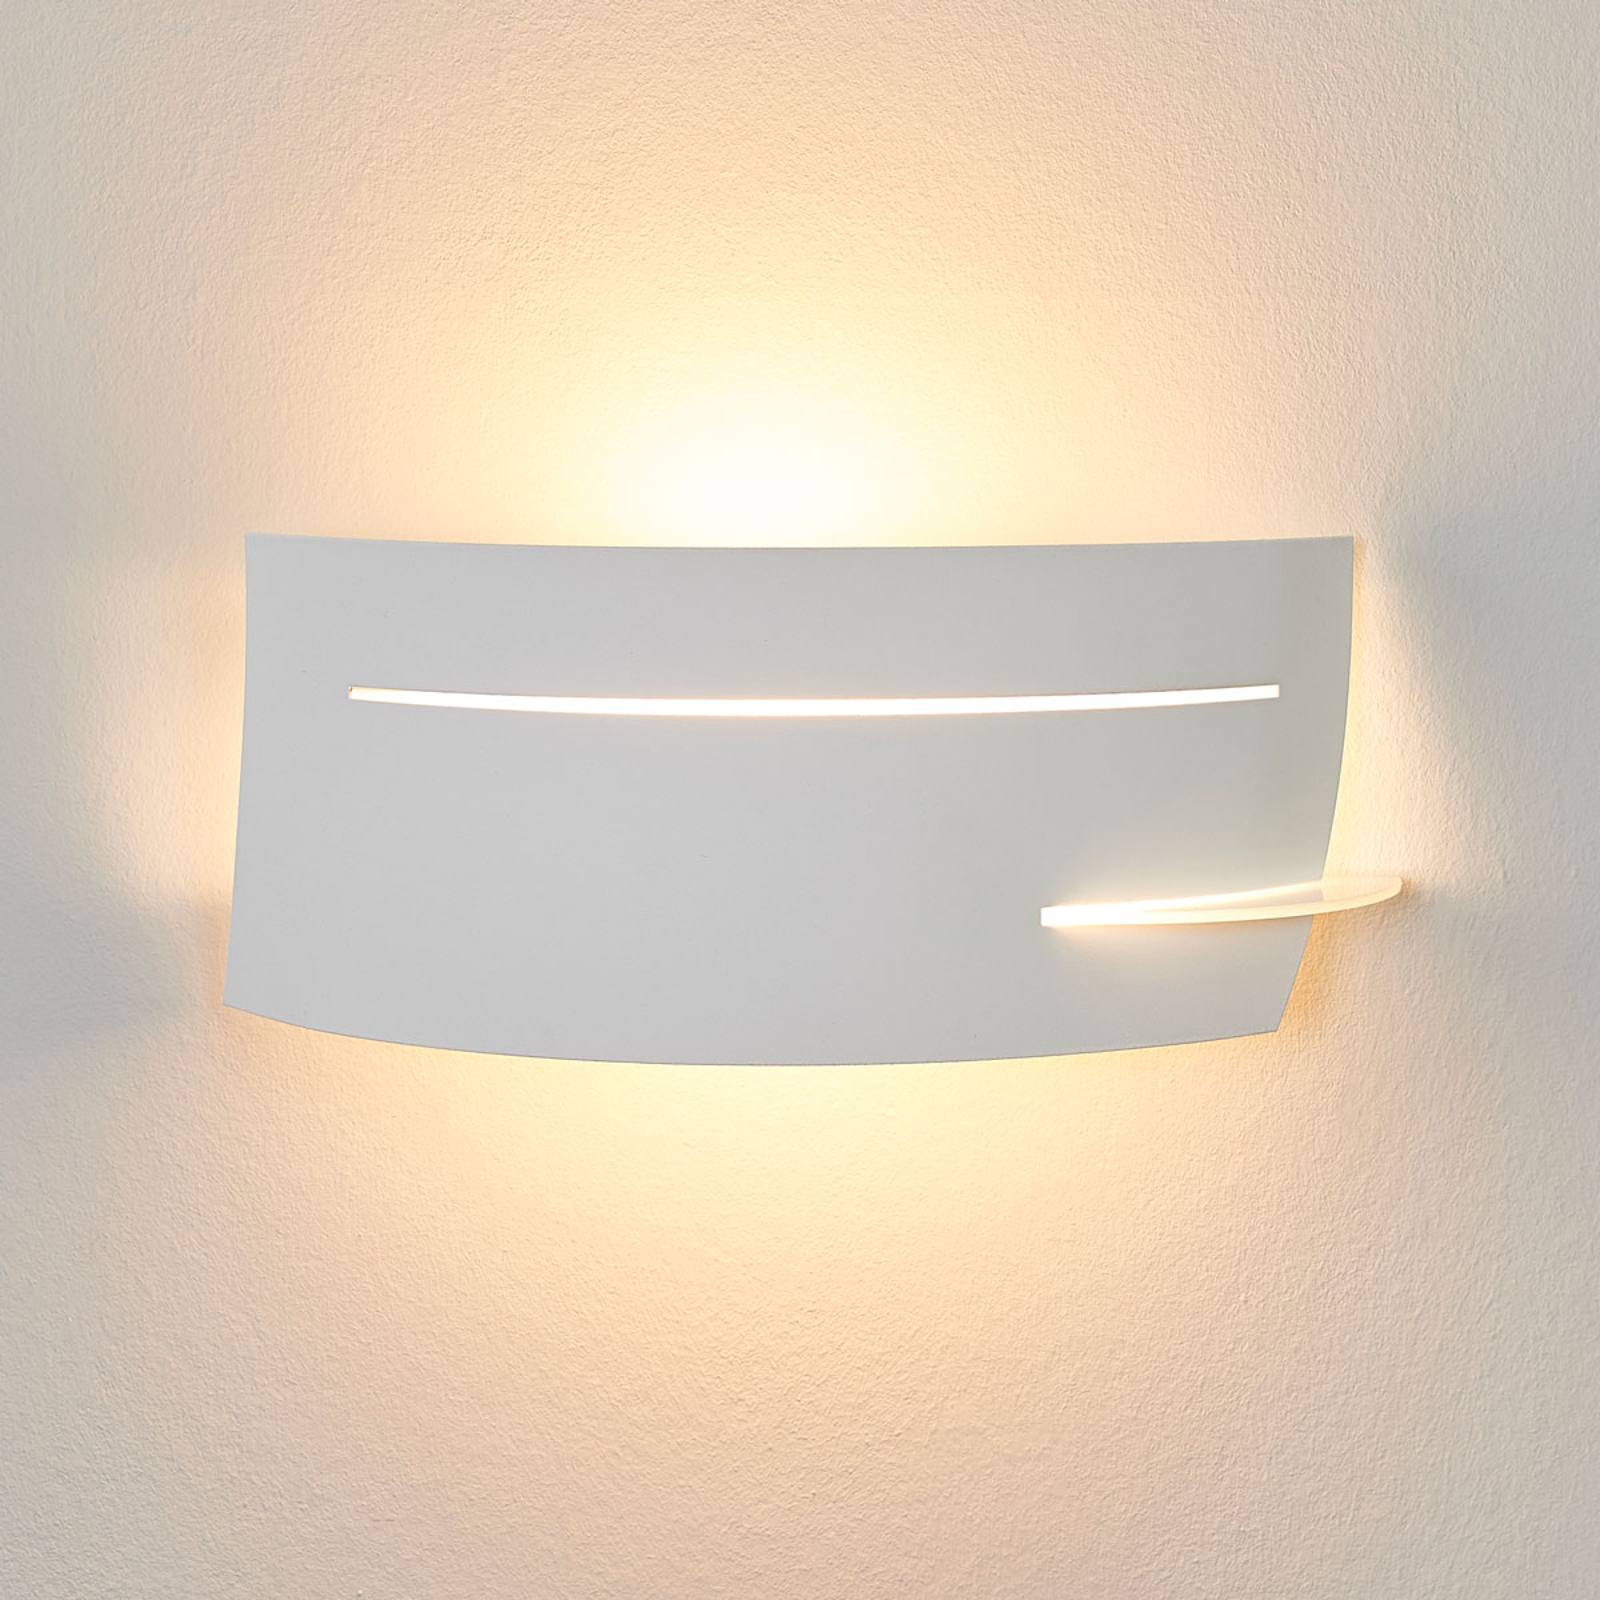 Discrete wandlamp Keyron in wit